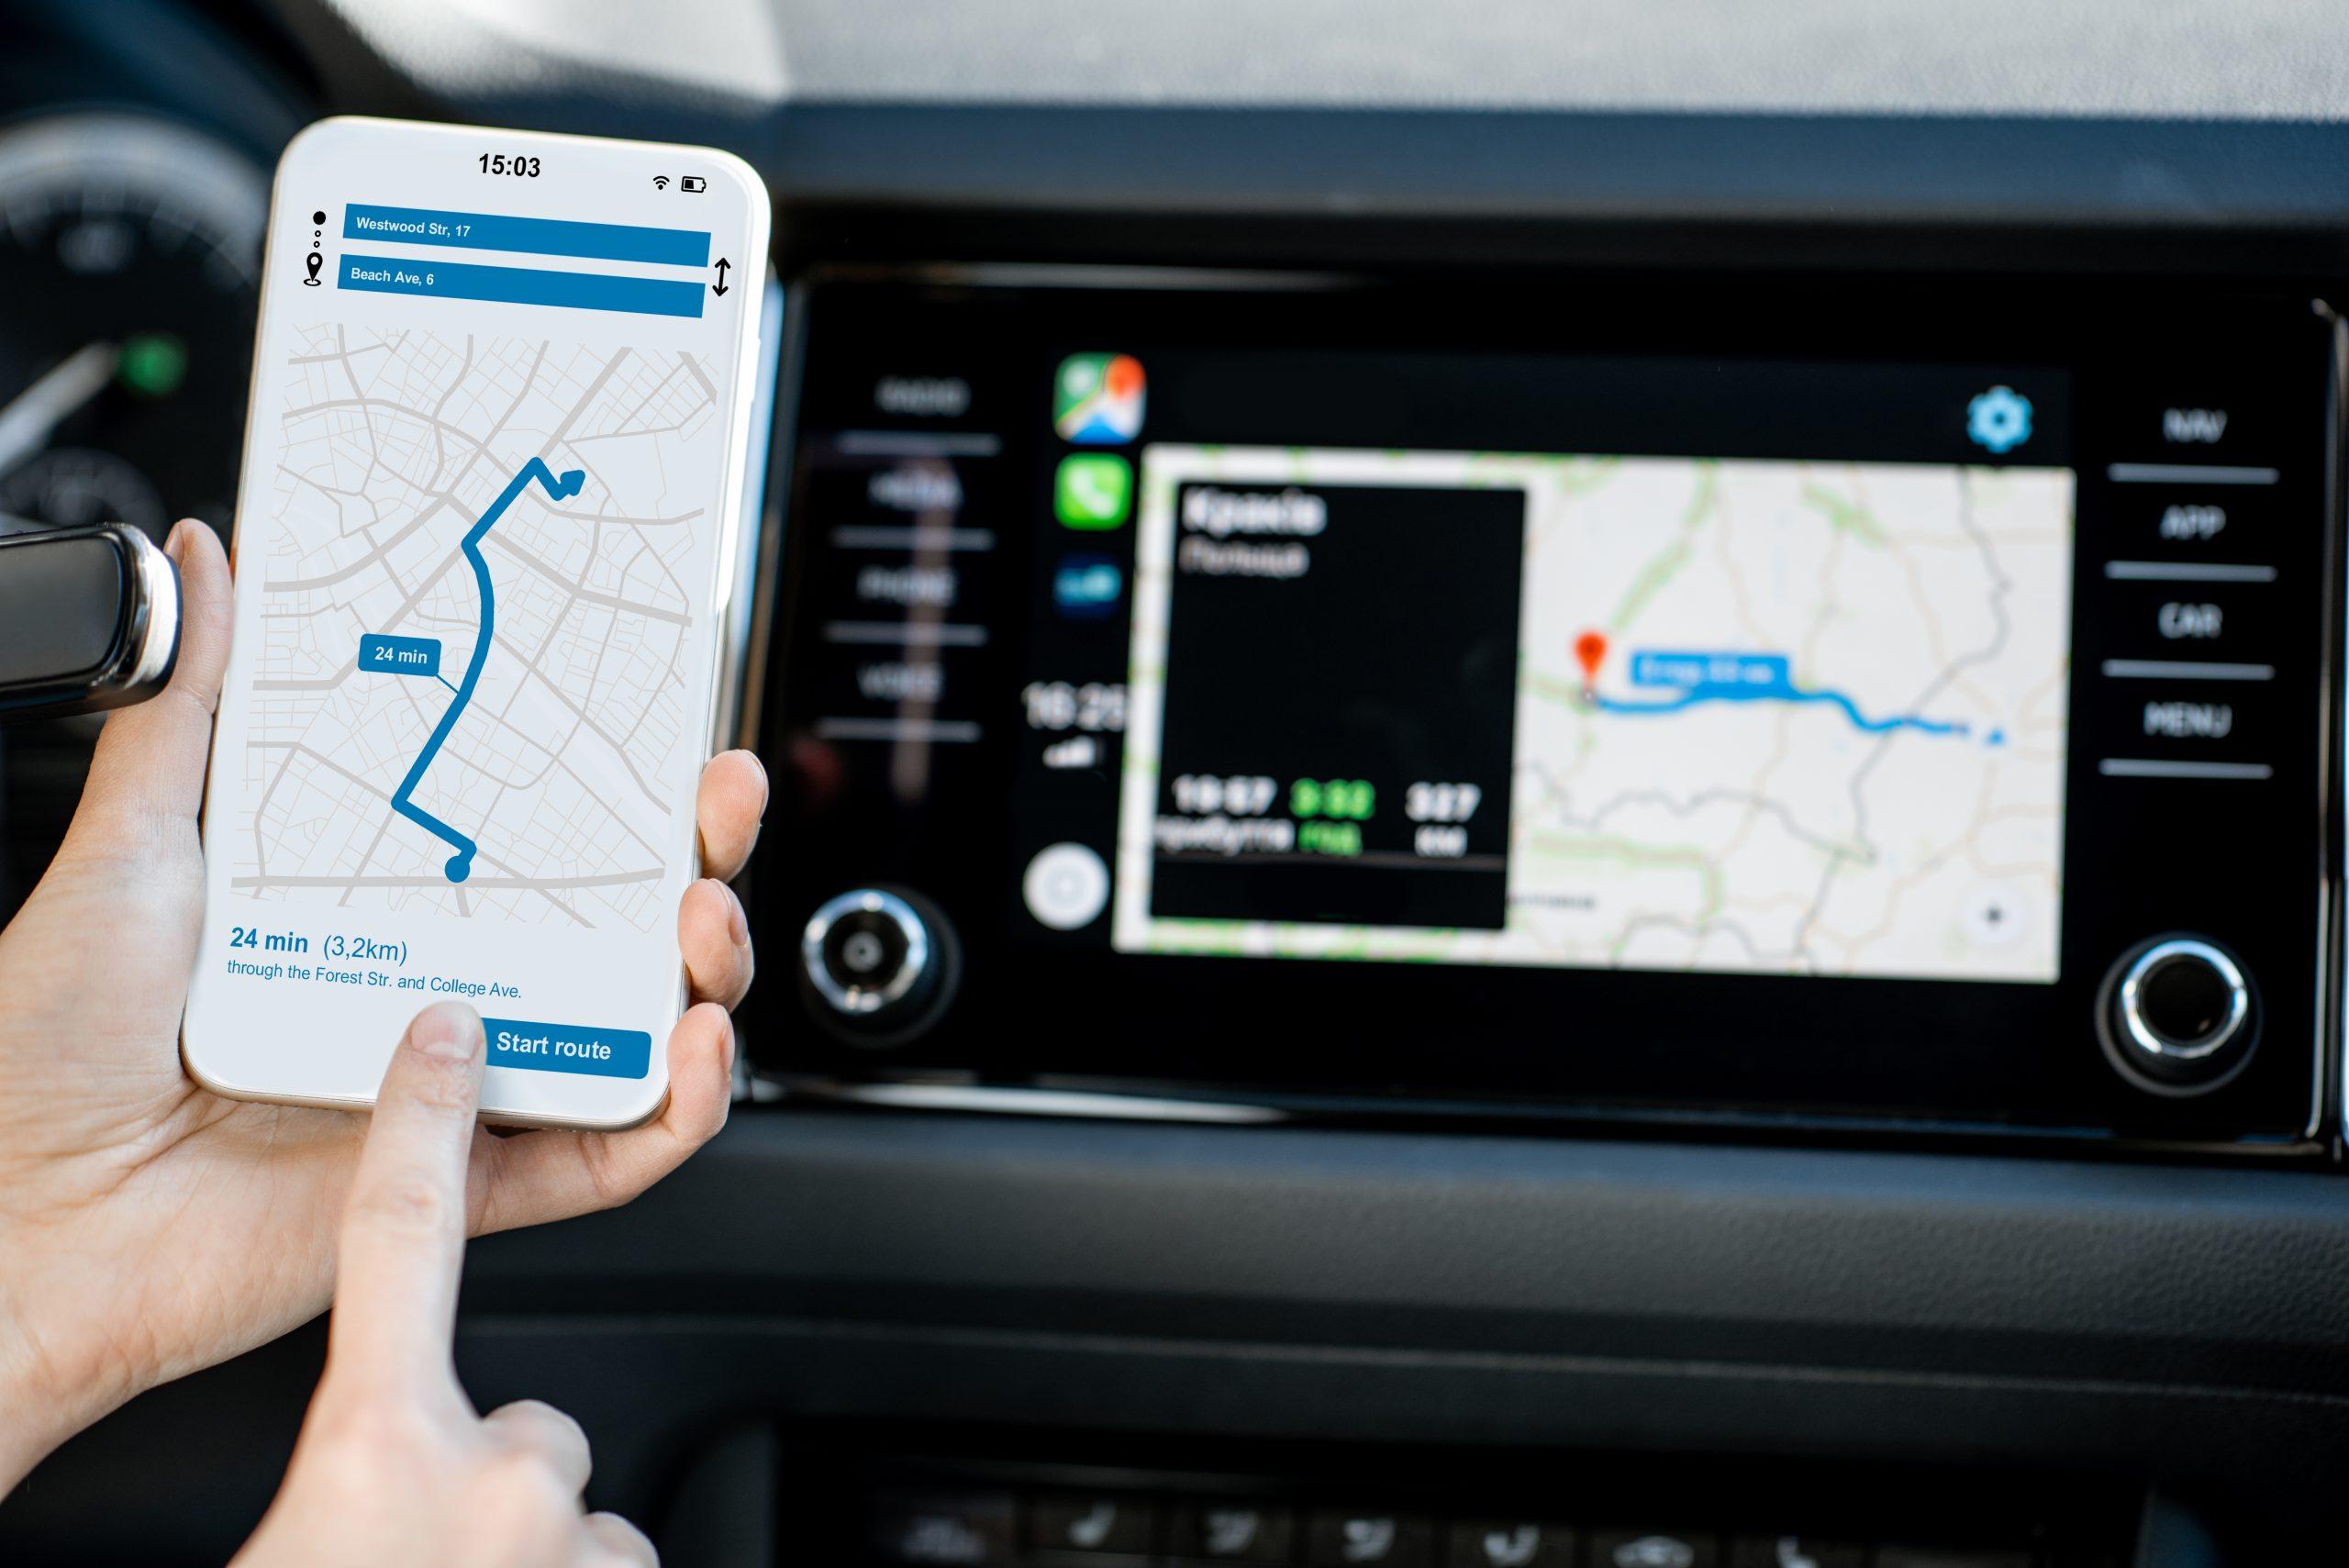 smart-phone-with-navigation-app